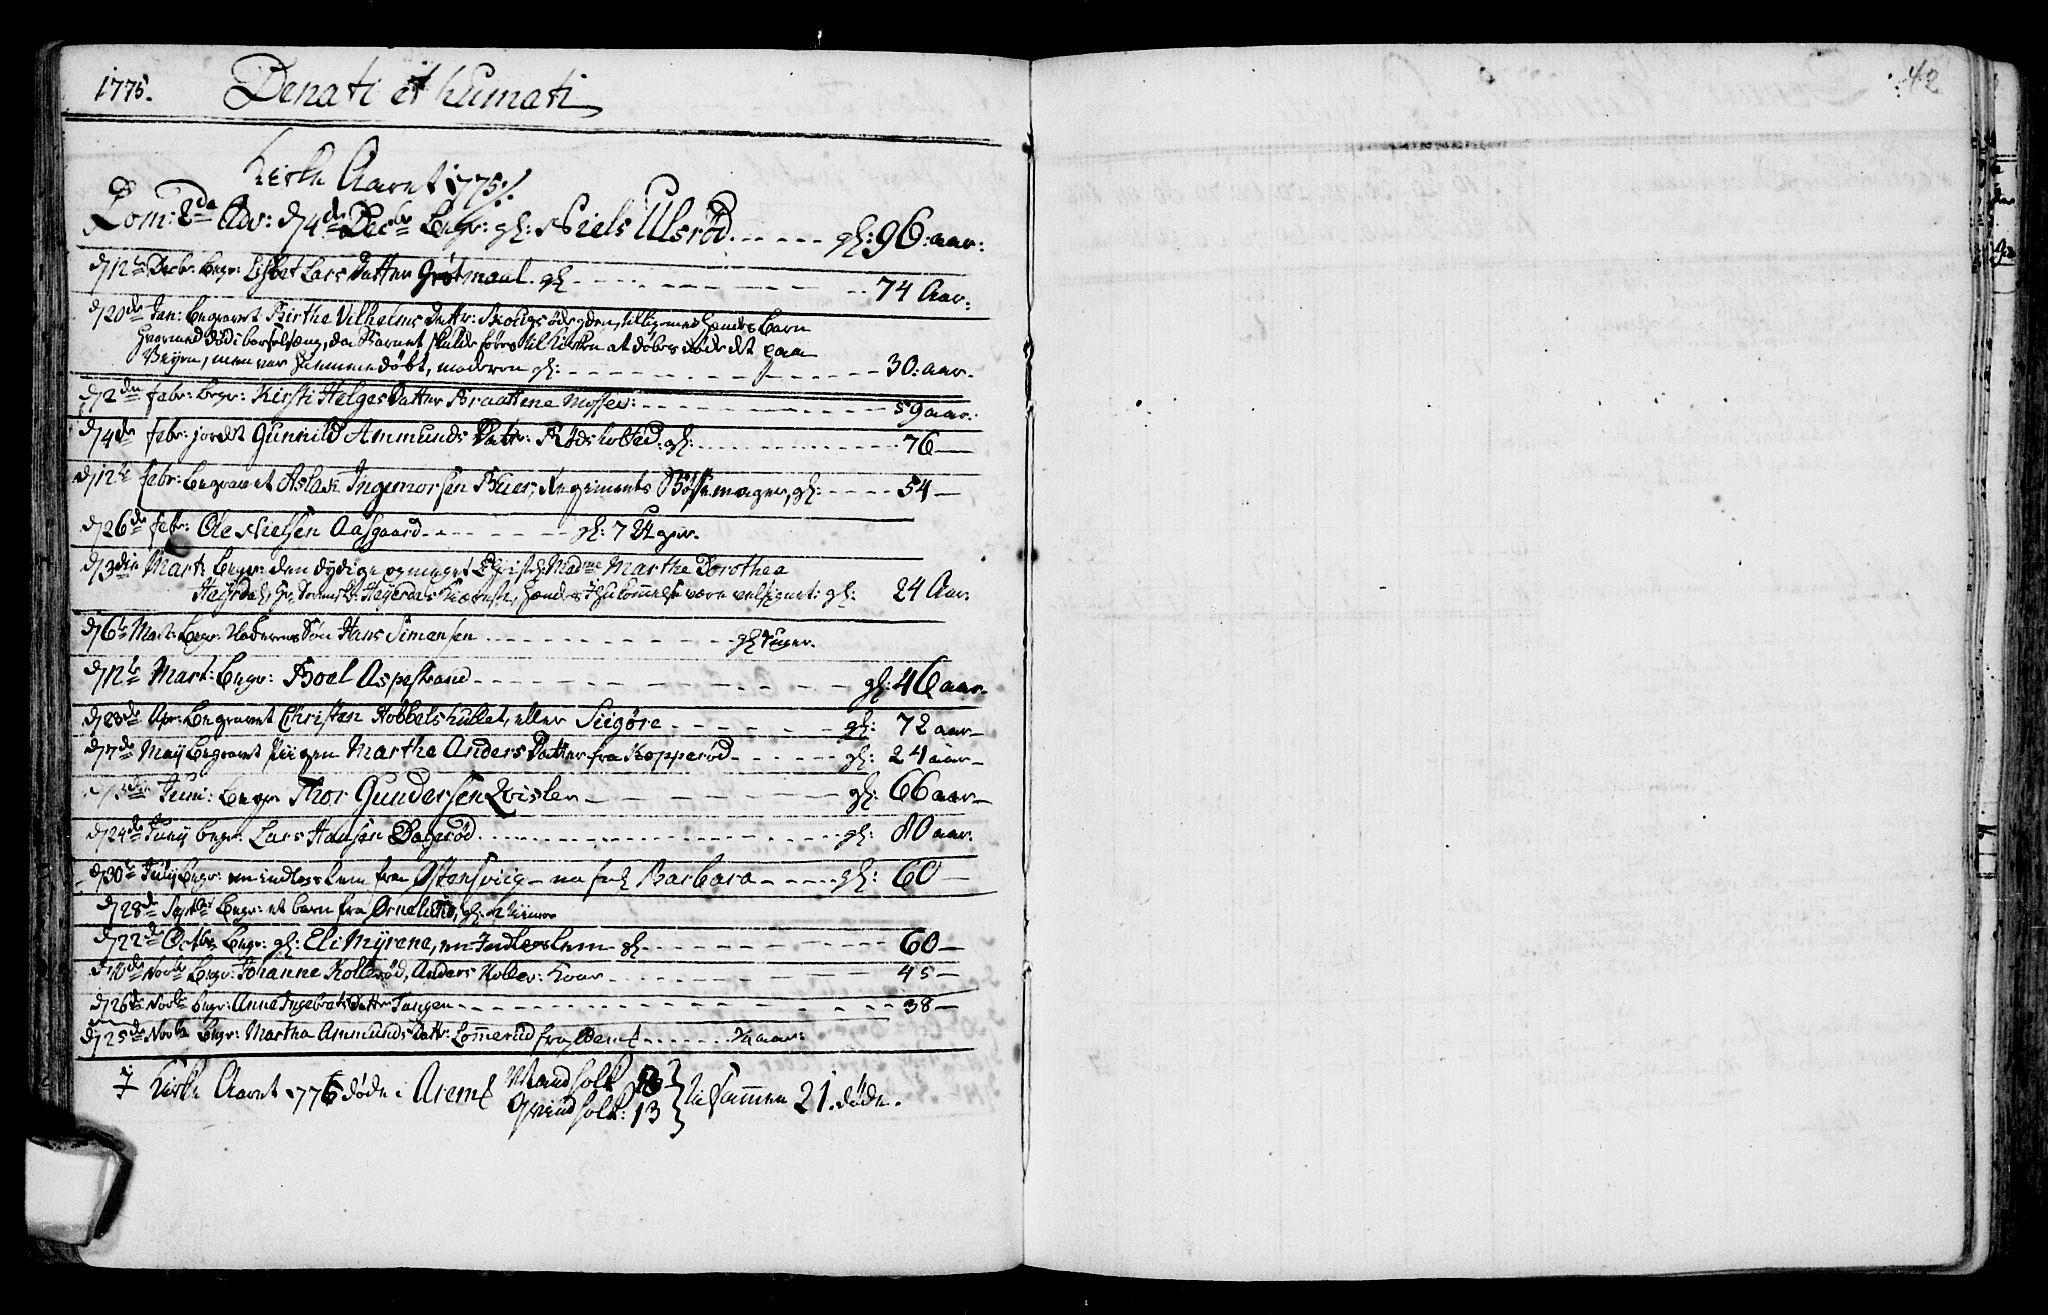 SAO, Aremark prestekontor Kirkebøker, F/Fa/L0003: Ministerialbok nr. I 3, 1745-1795, s. 42